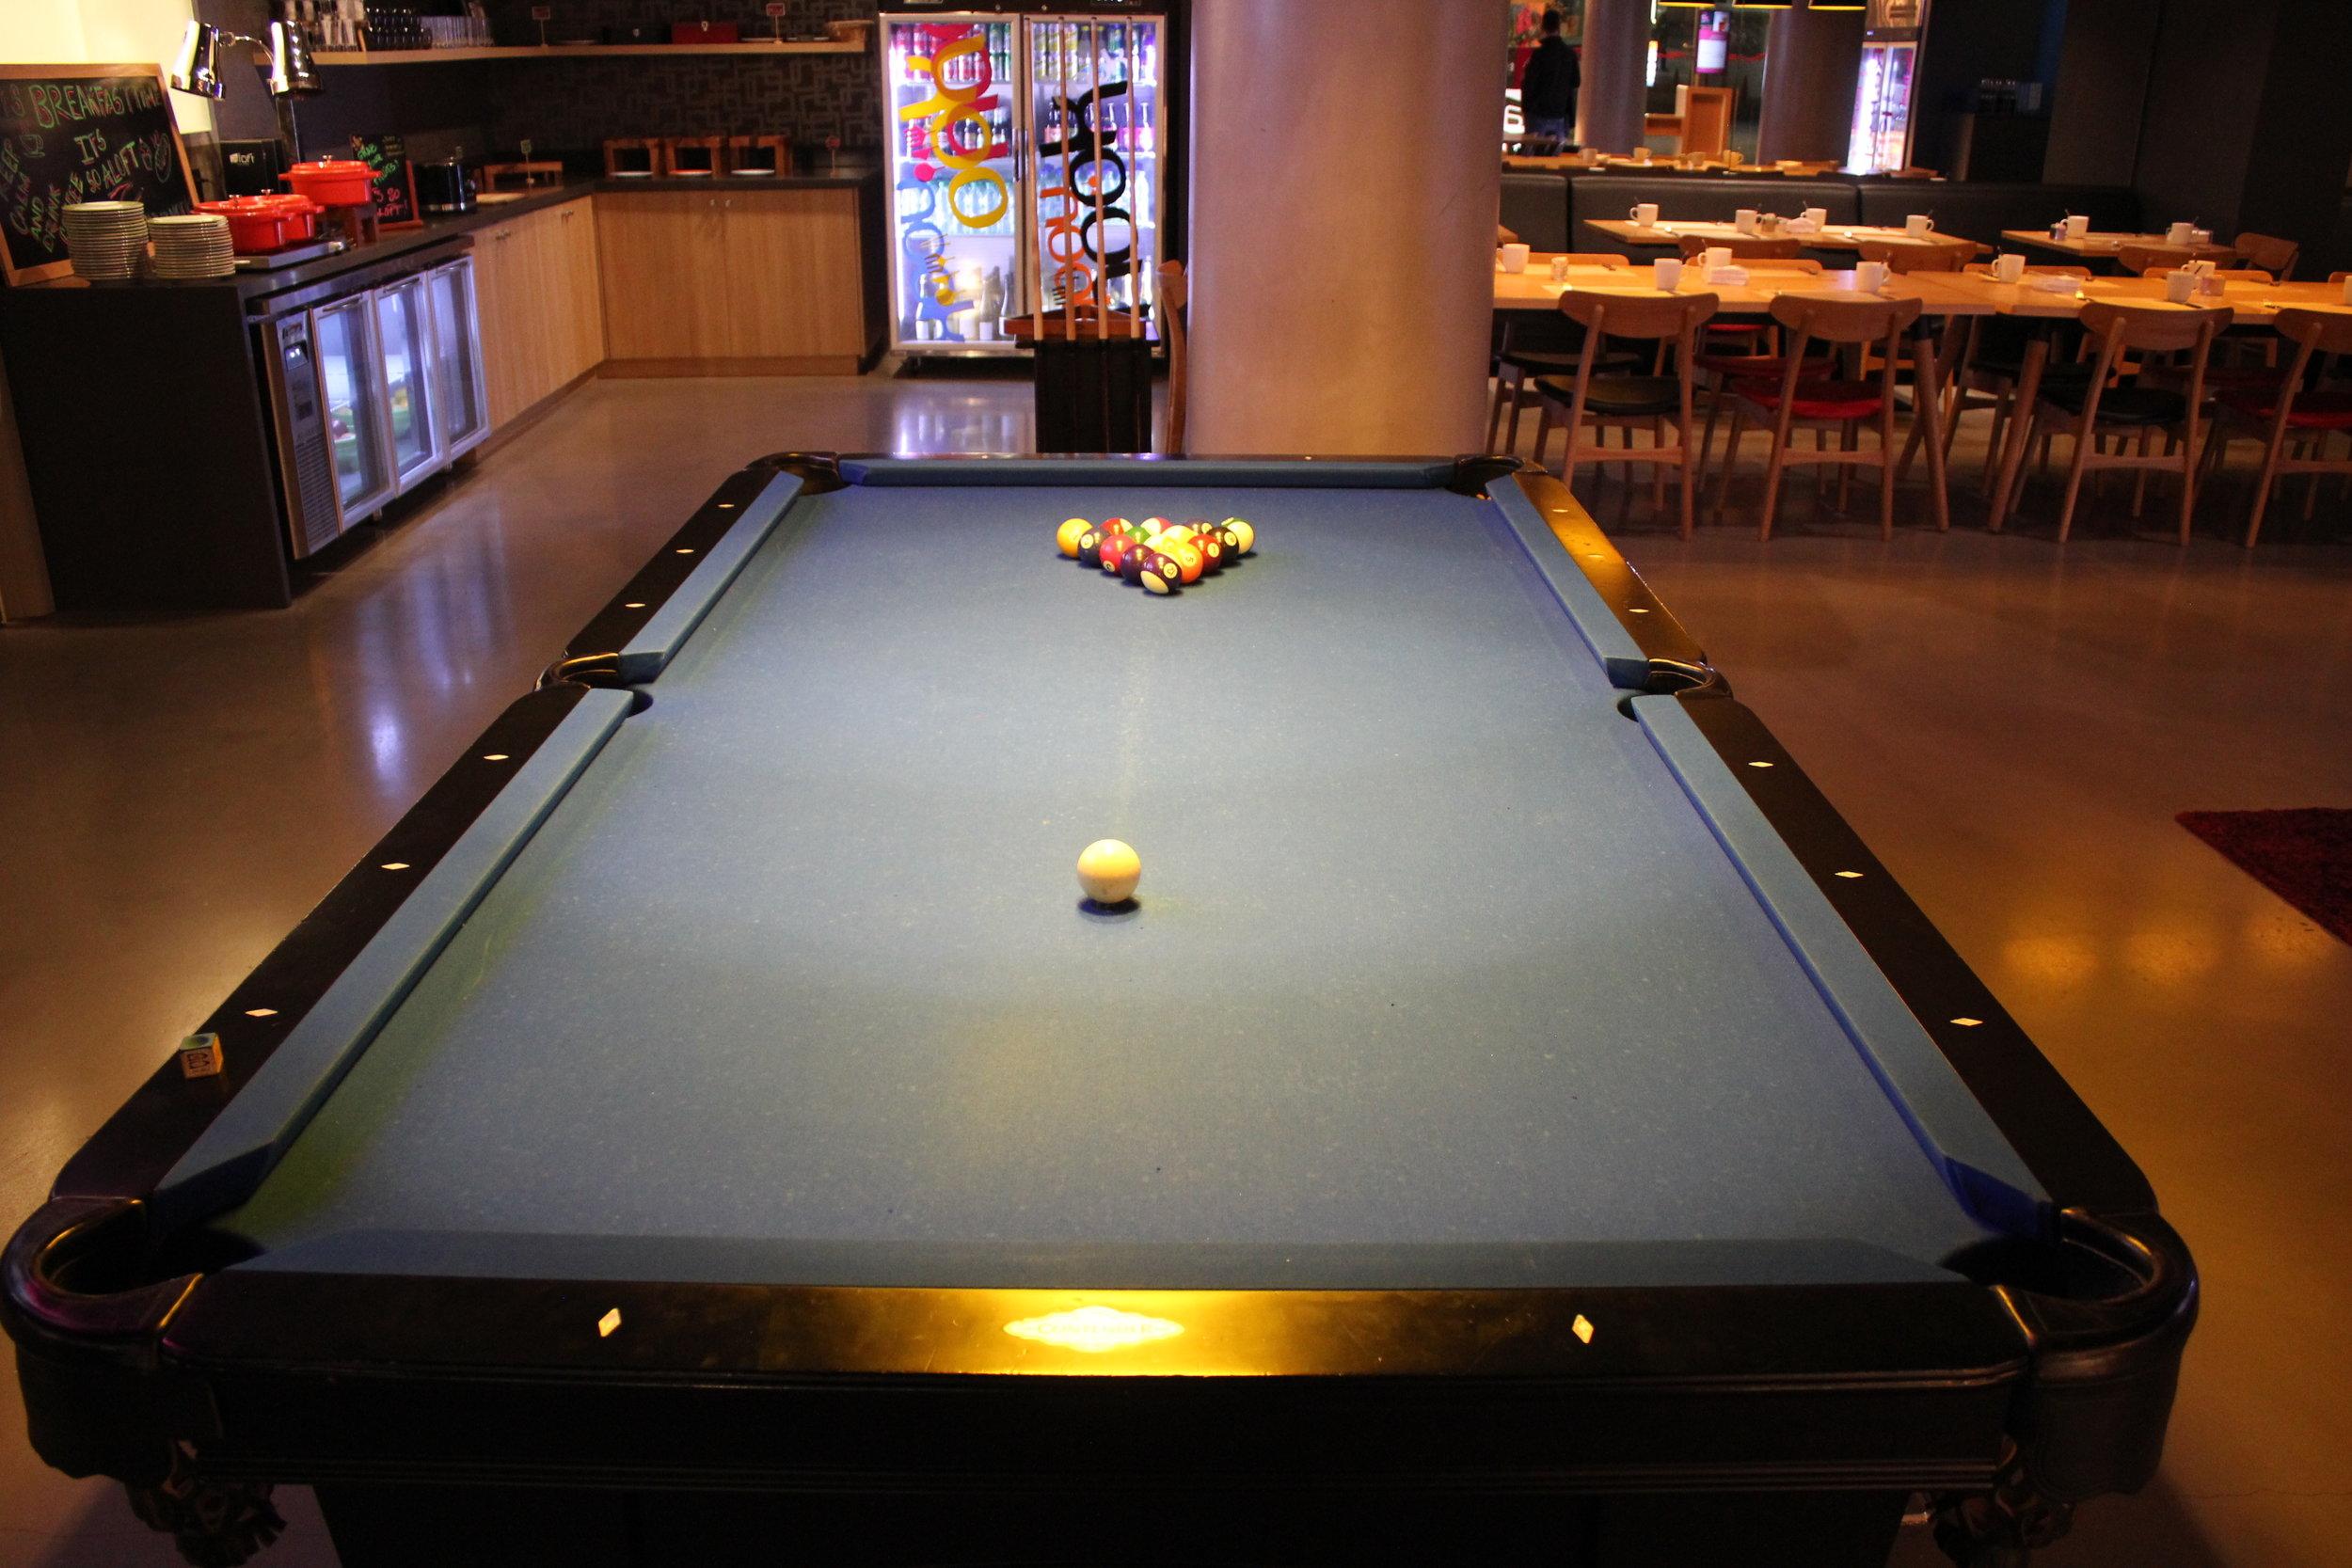 Aloft Montevideo – Pool table